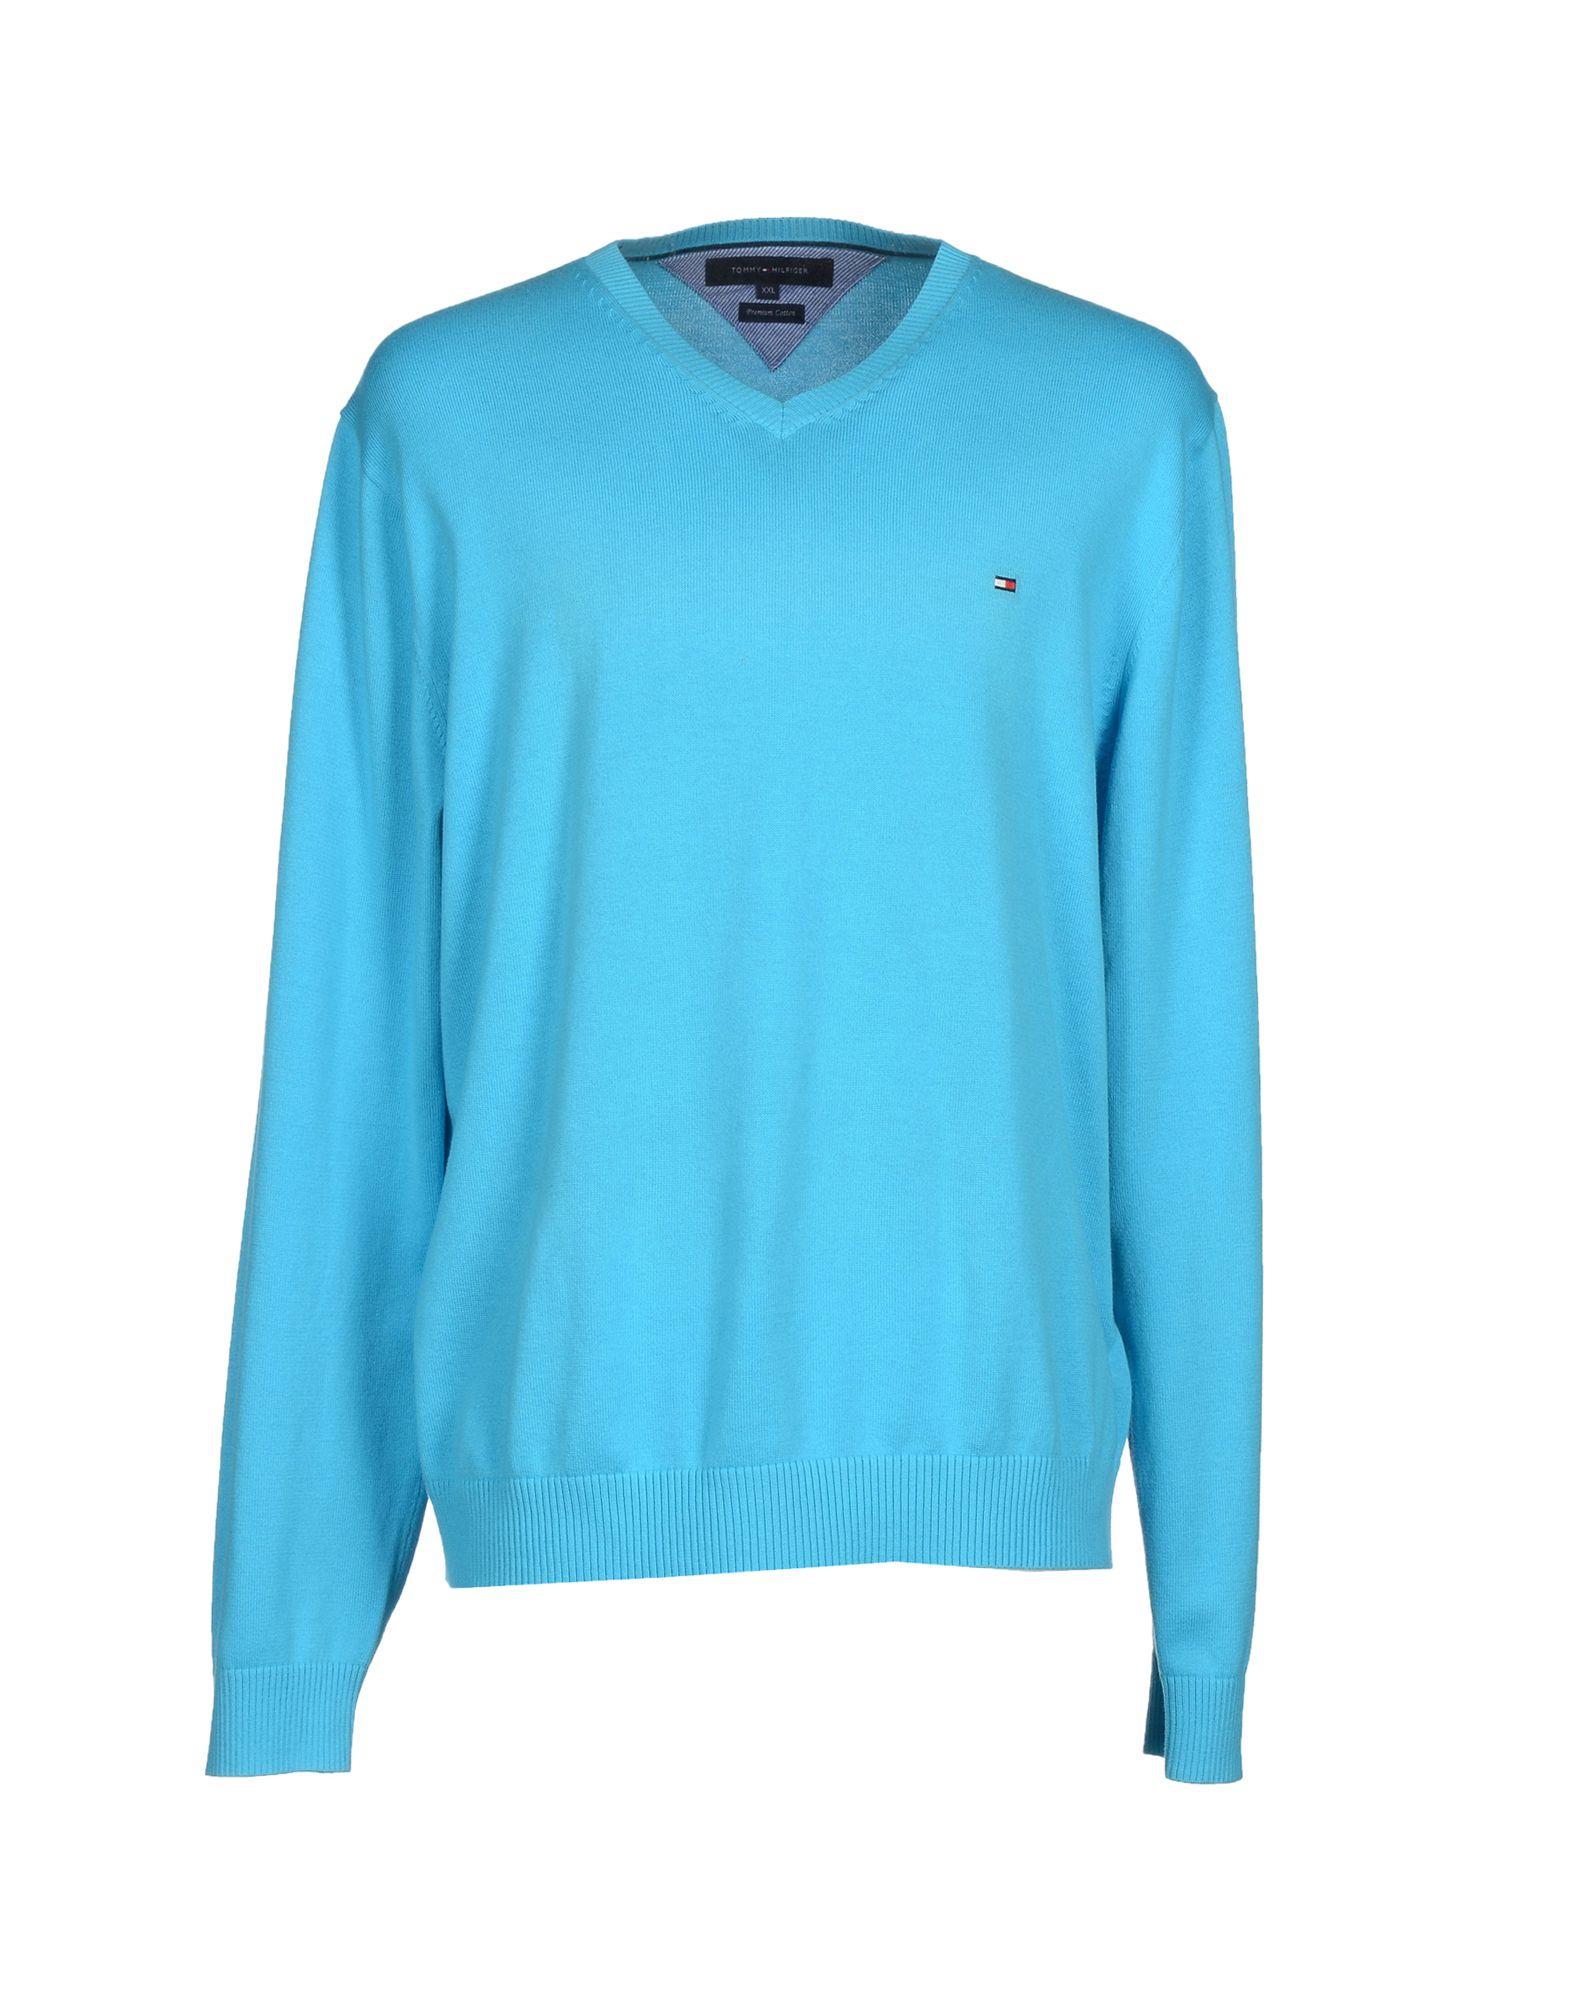 Turtleneck Sweaters For Men